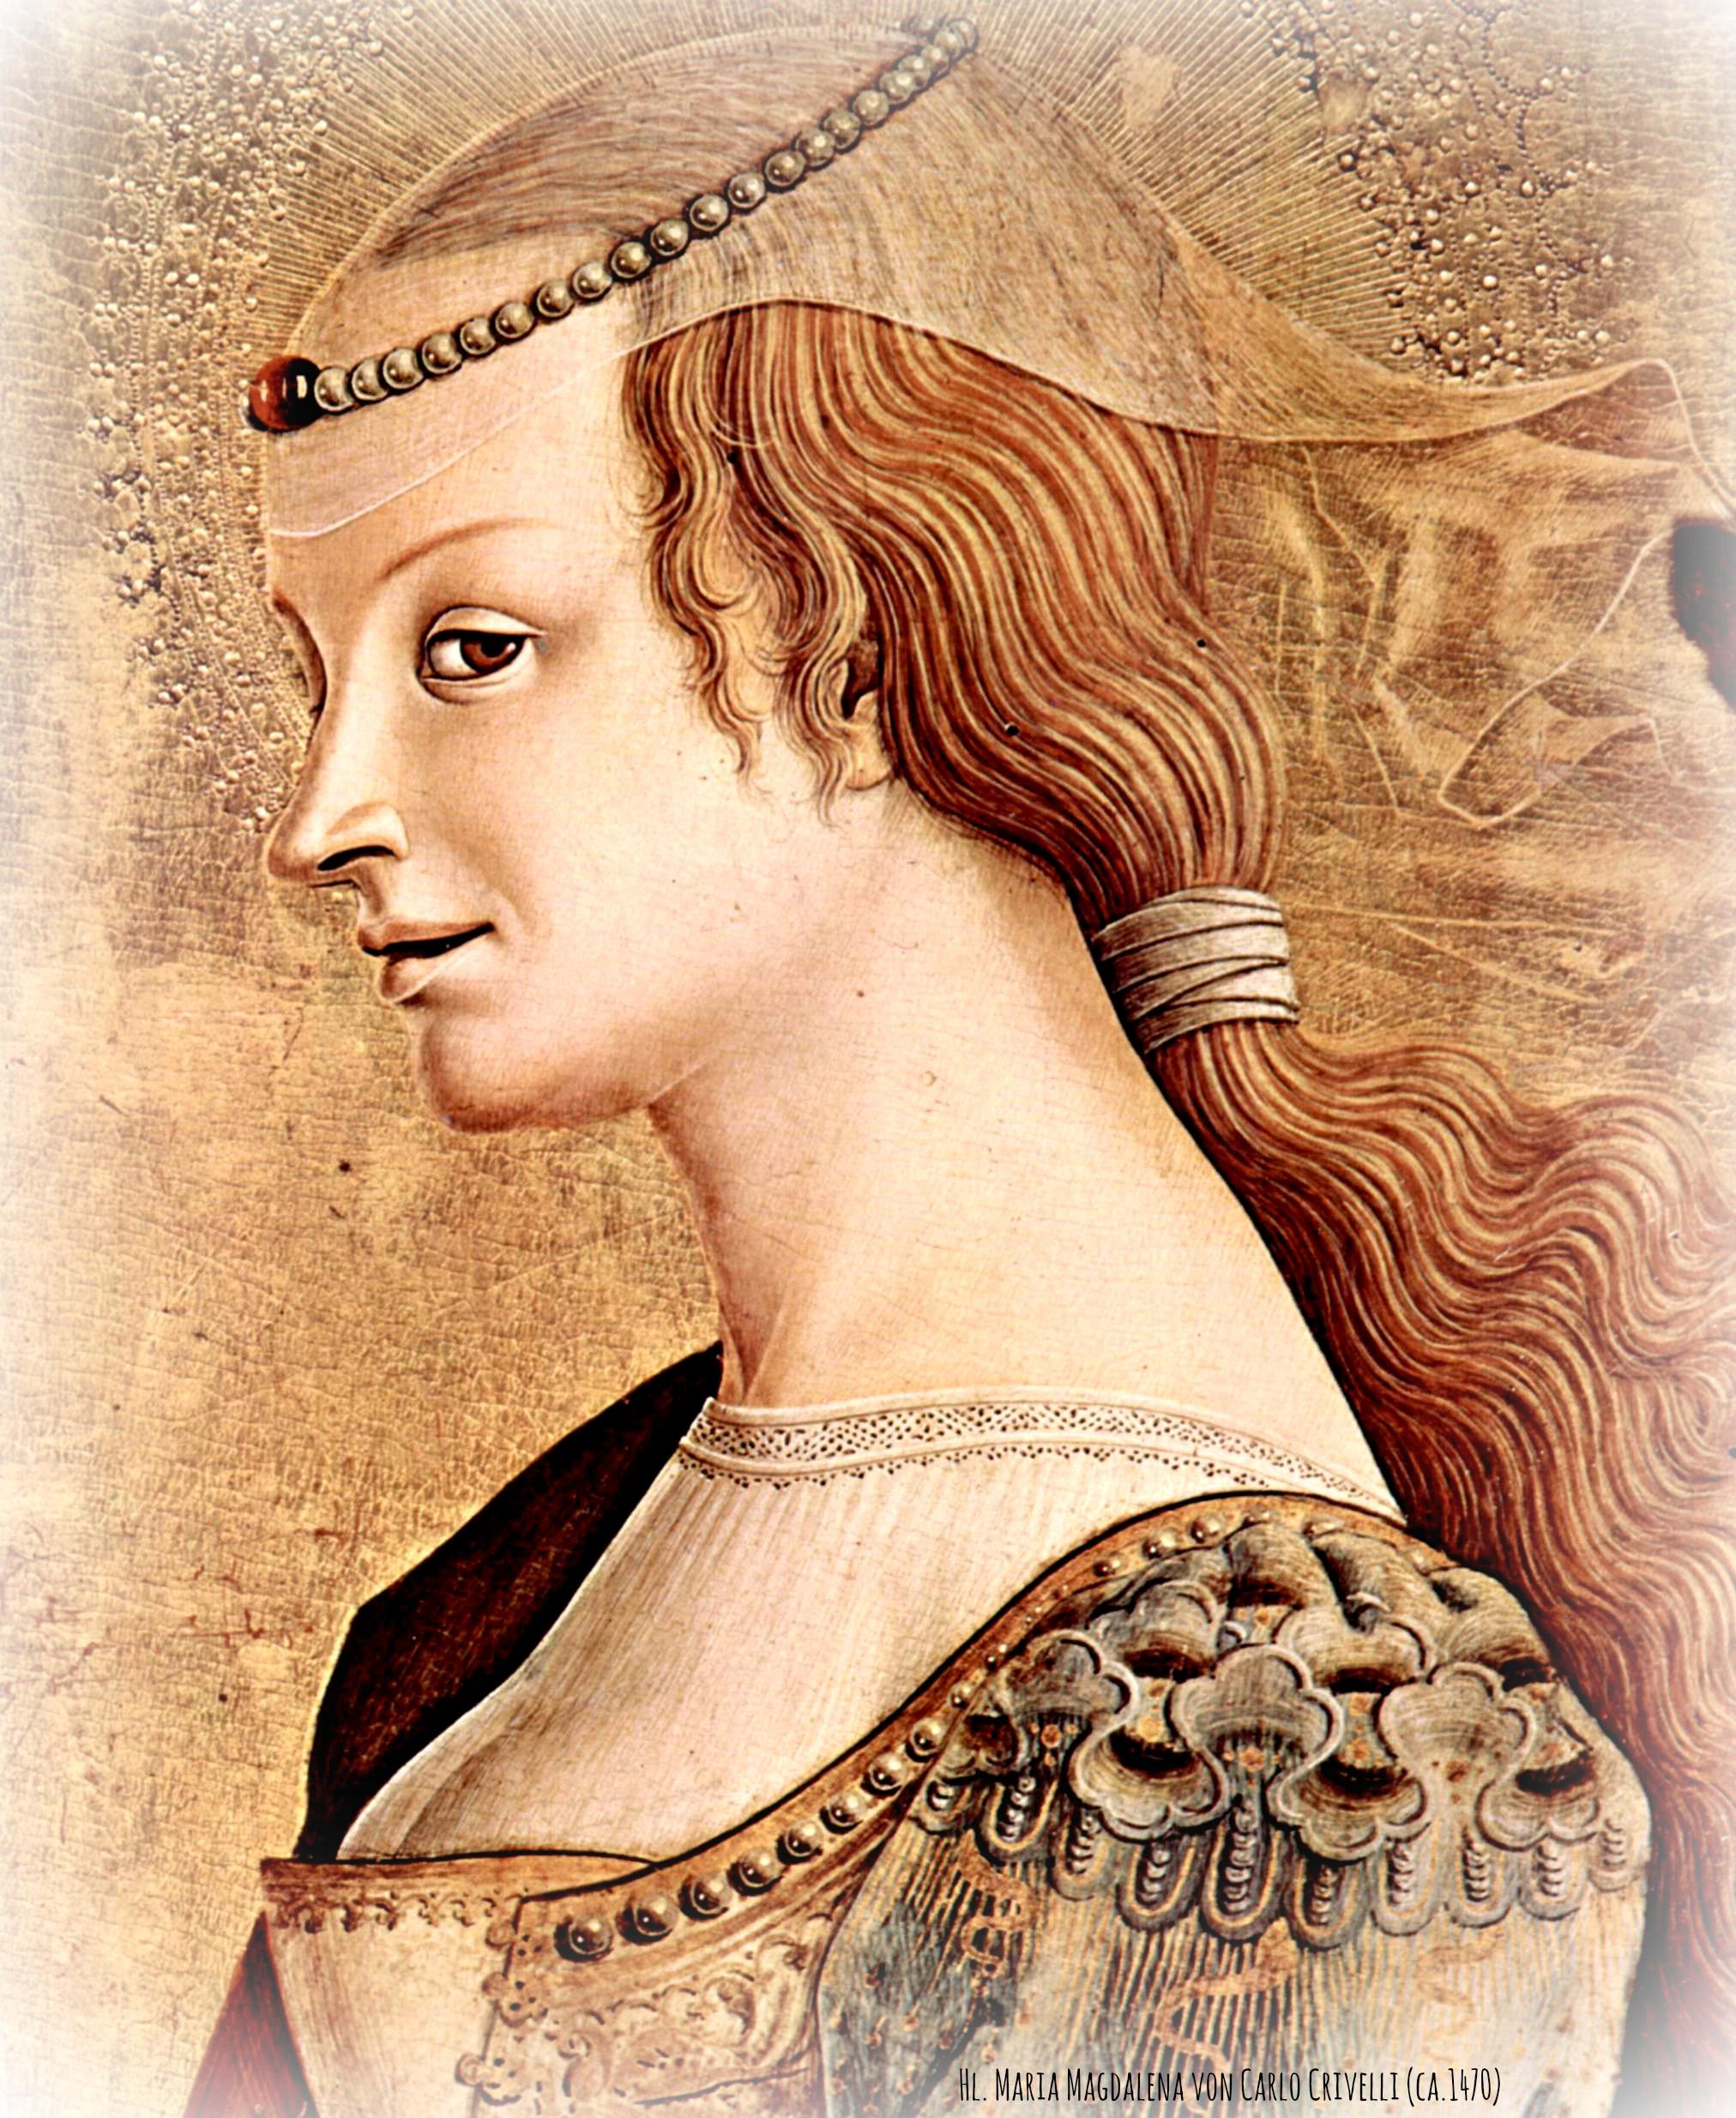 Renaissance Frau - Bild von Carlo Crivelli - http://dein-buntes-leben.de